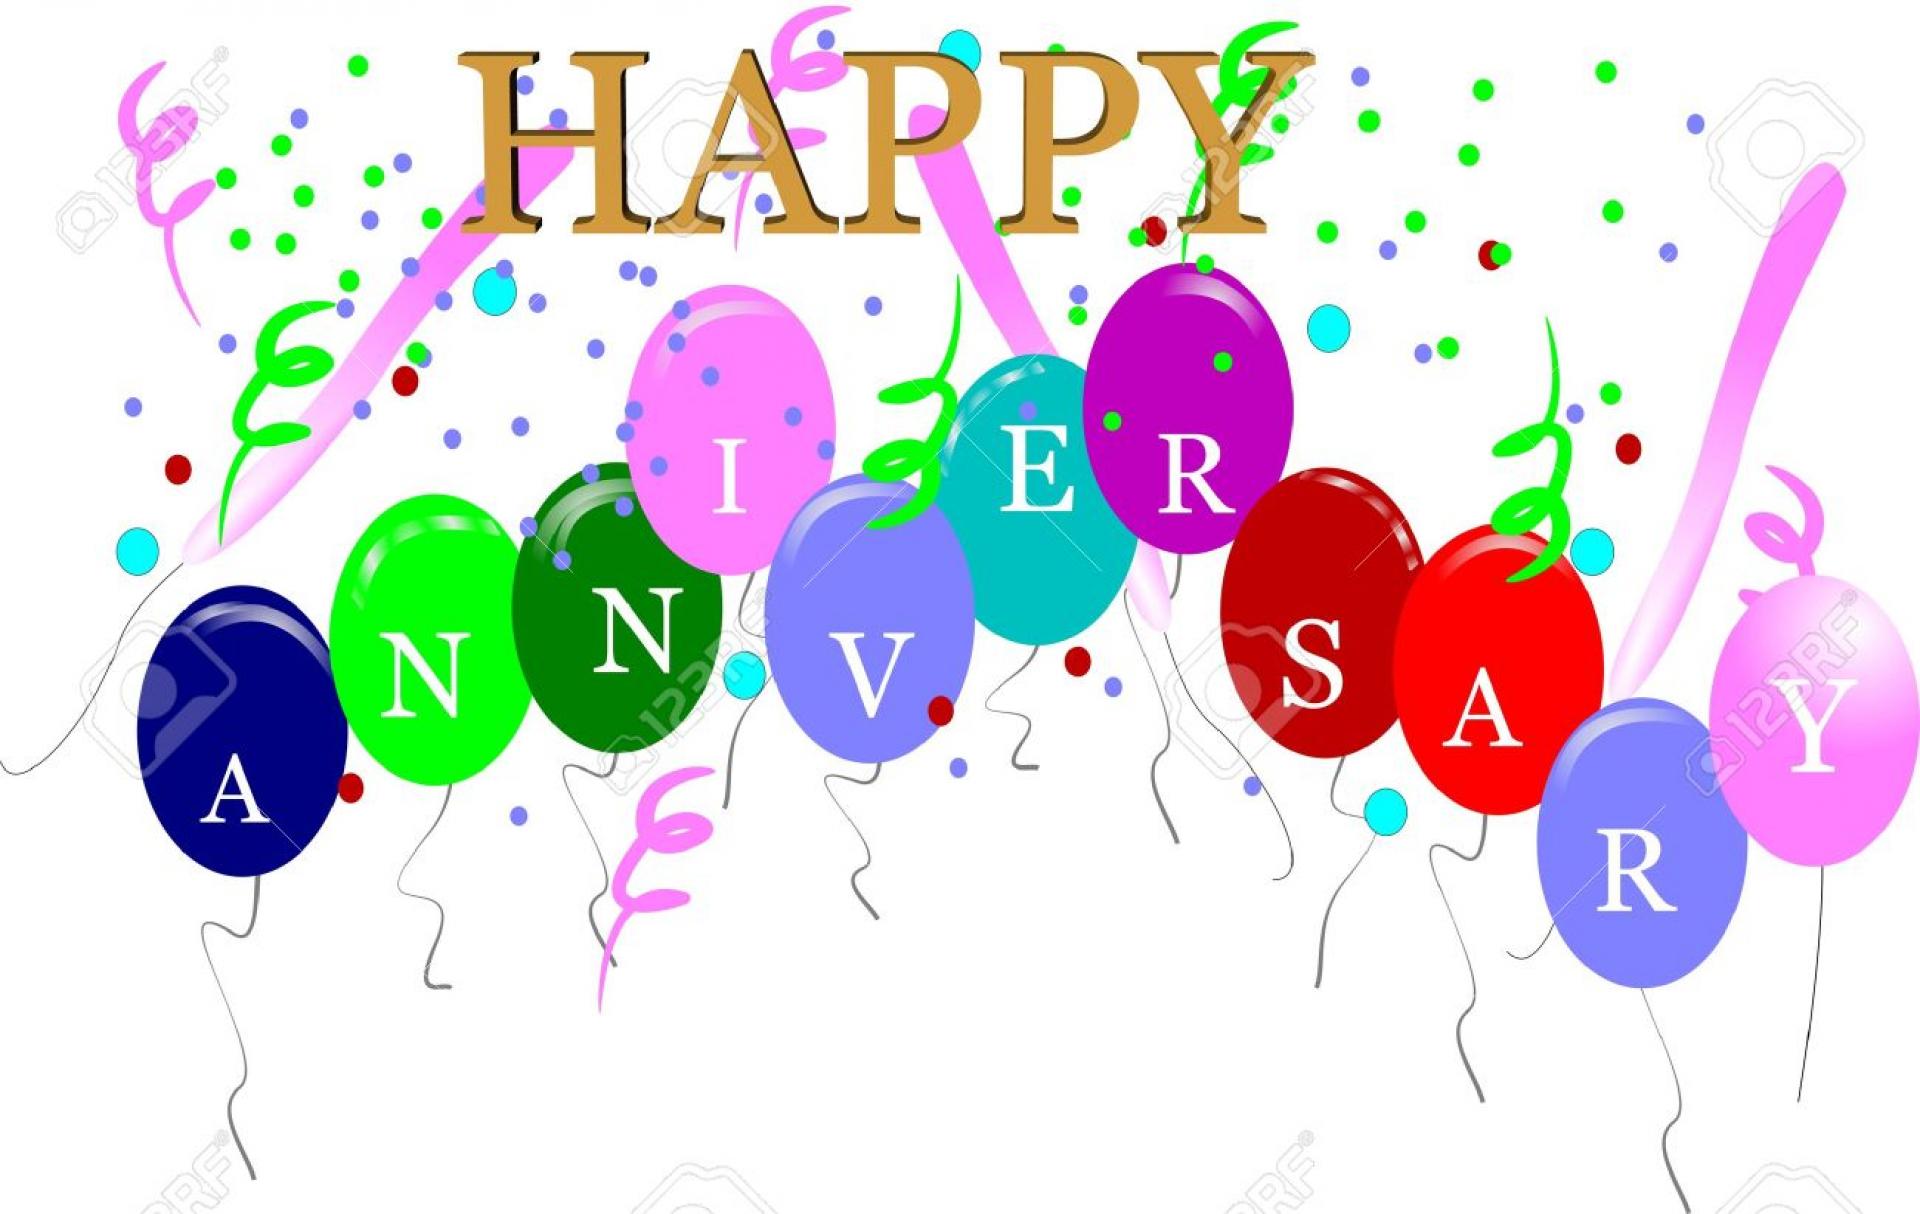 happy work anniversary clipart